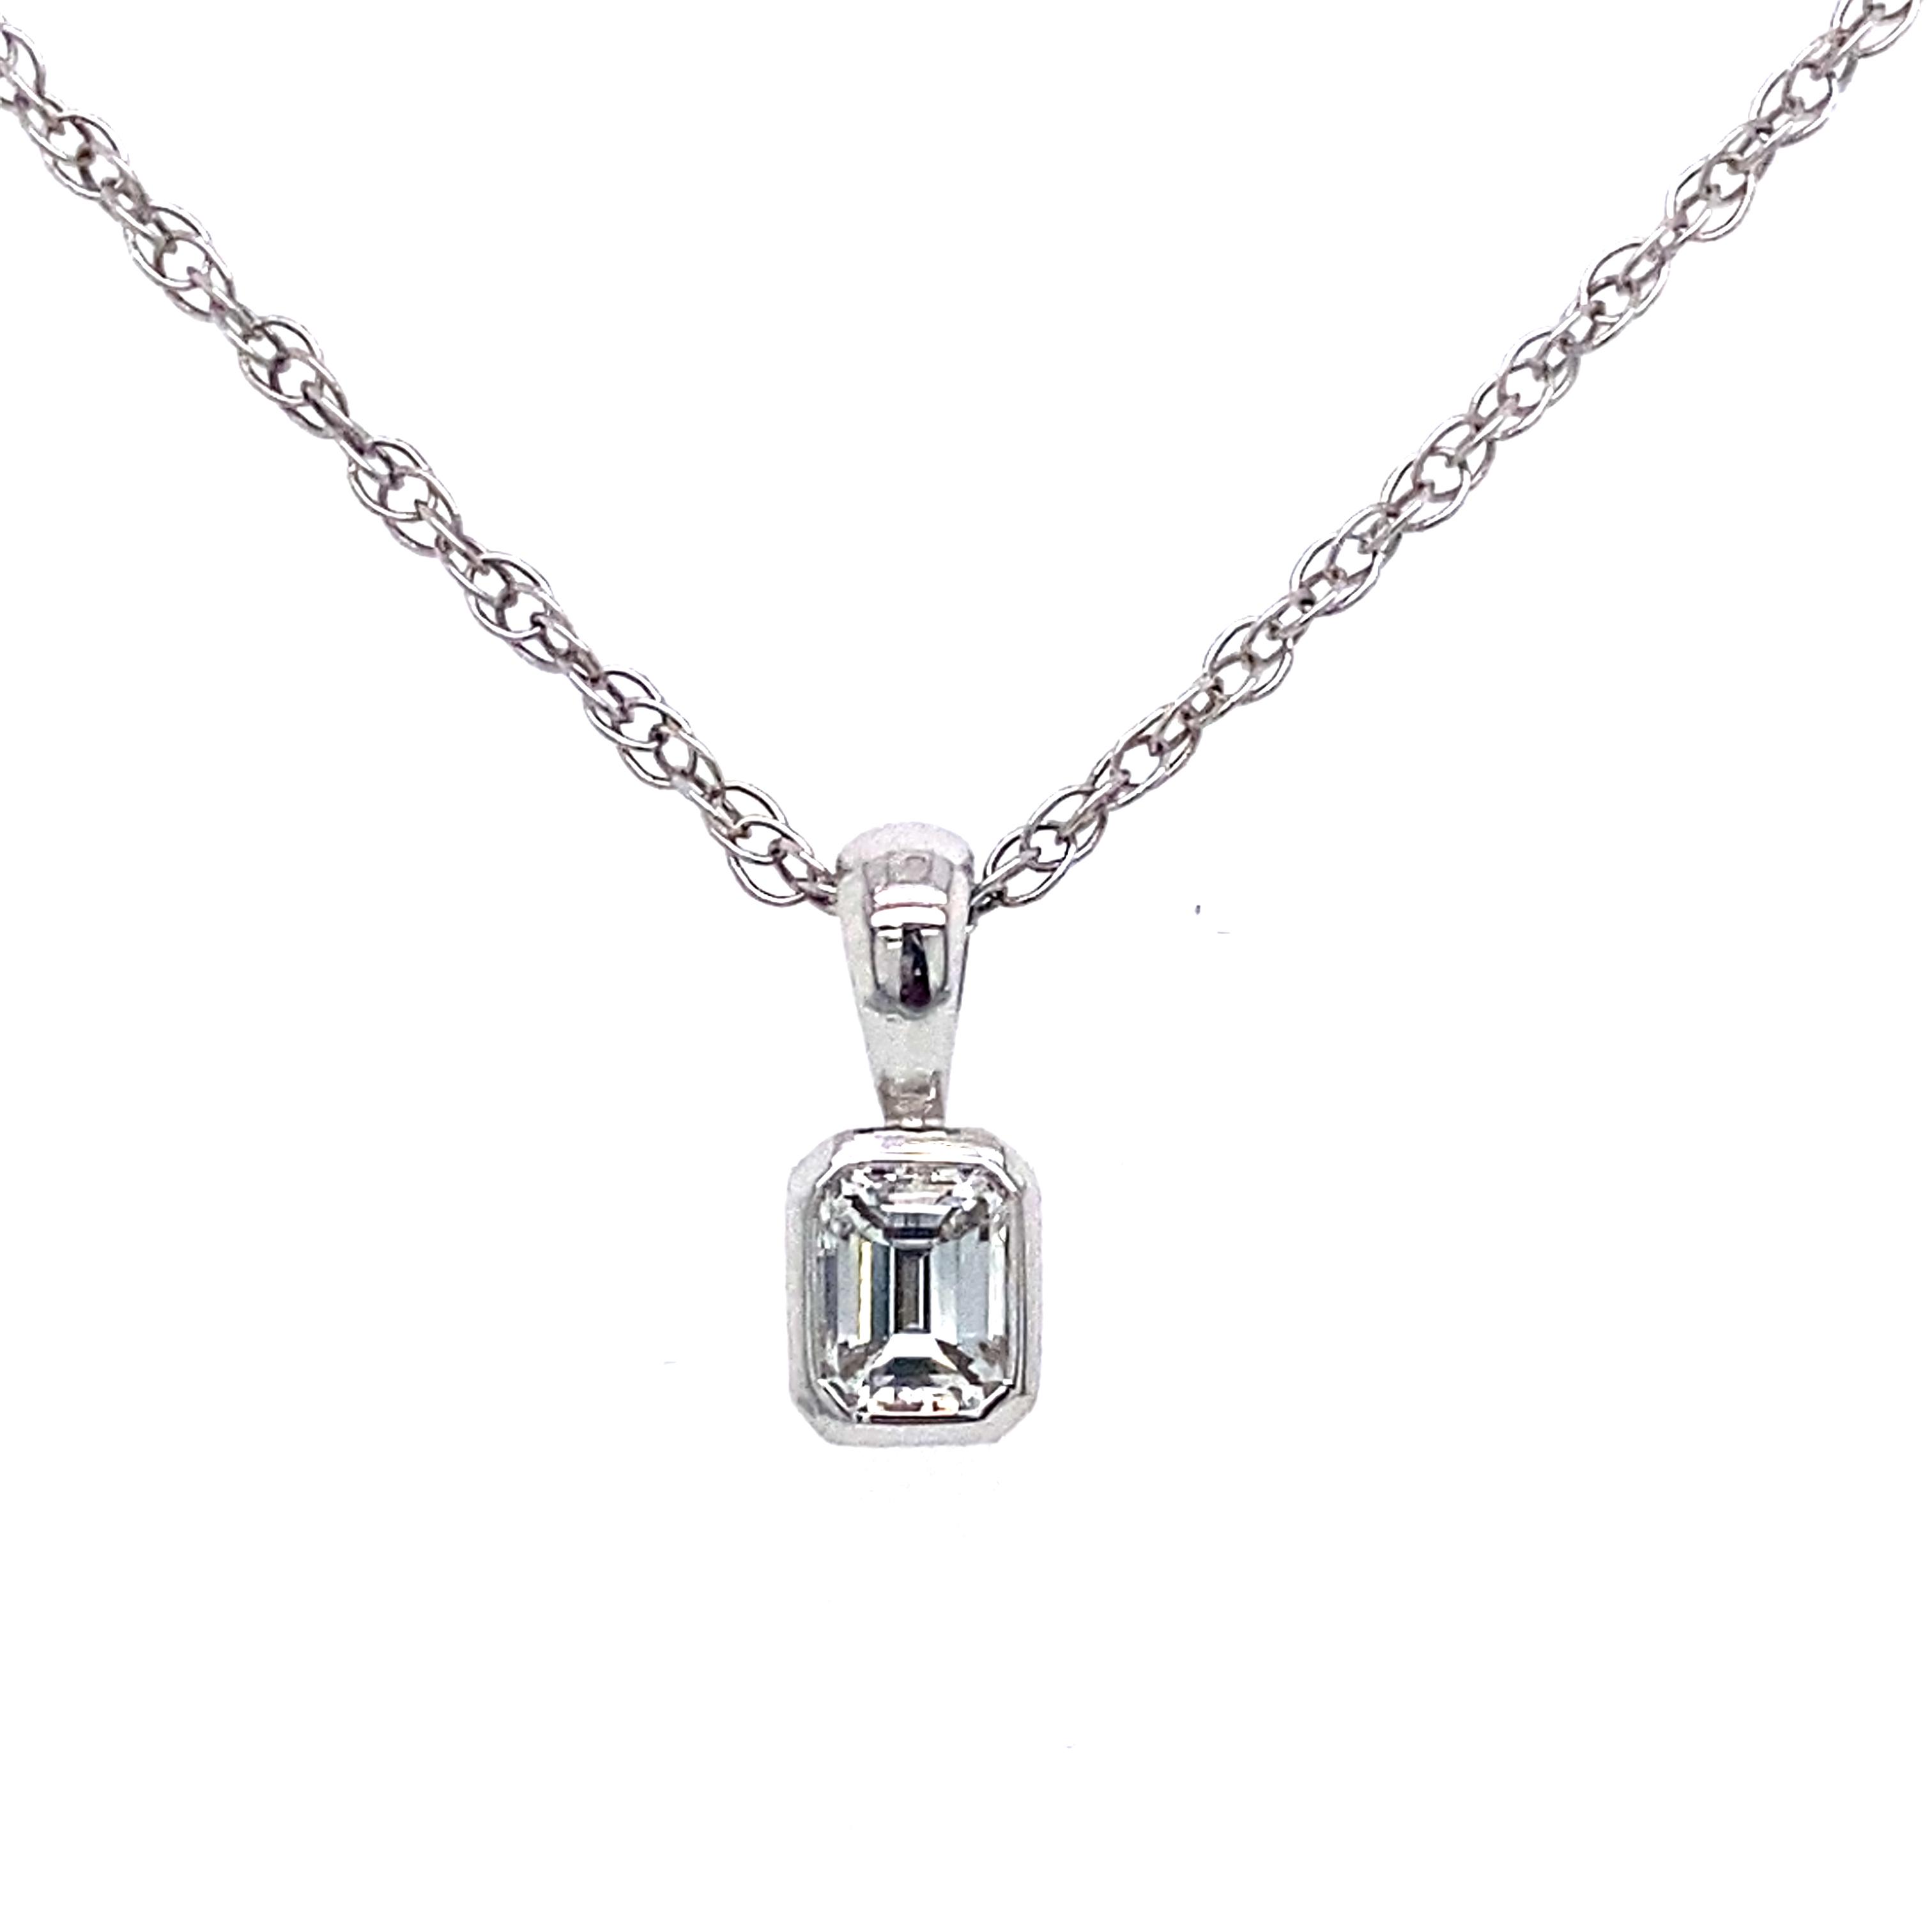 Emerald Cut Diamond Pendant 0.27 E VVS2